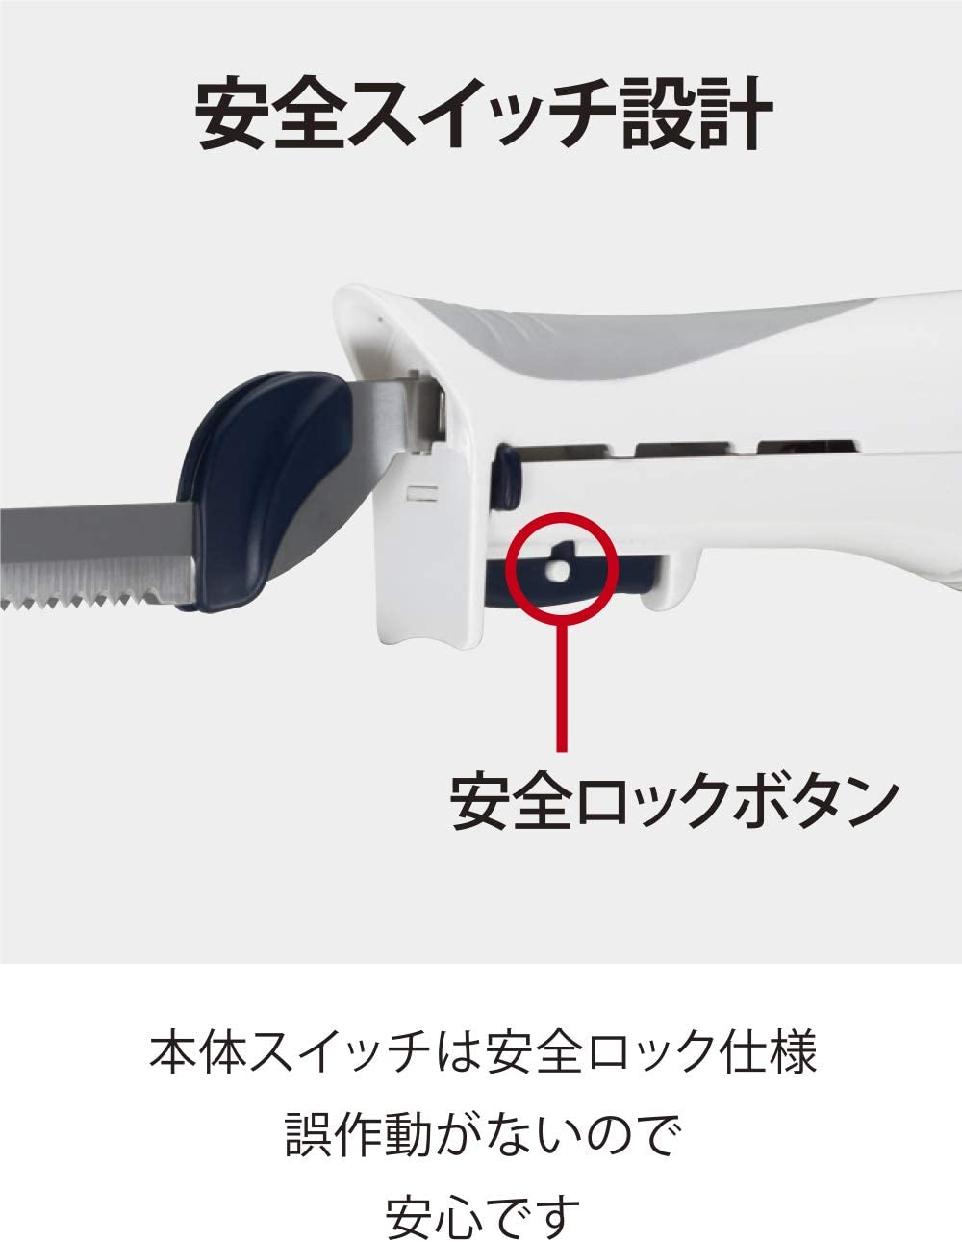 BLACK+DECKER(ブラックデッカー) 電動ブレッド&マルチナイフ EK700 ホワイトの商品画像6